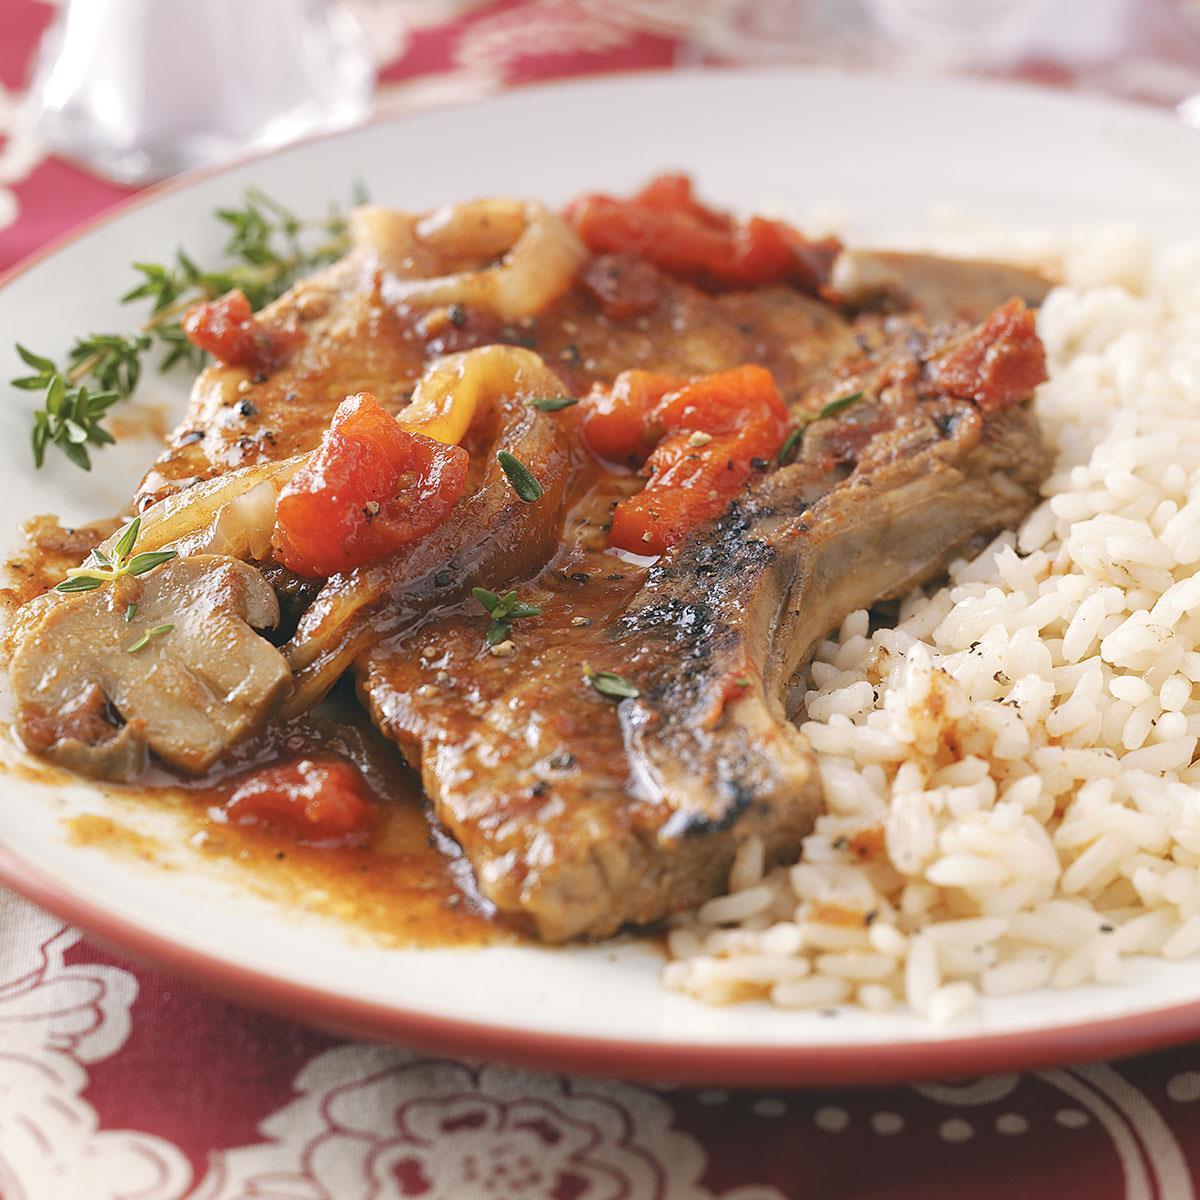 Healthy Pork Chop Slow Cooker Recipes  Tender Slow Cooker Pork Chops Recipe